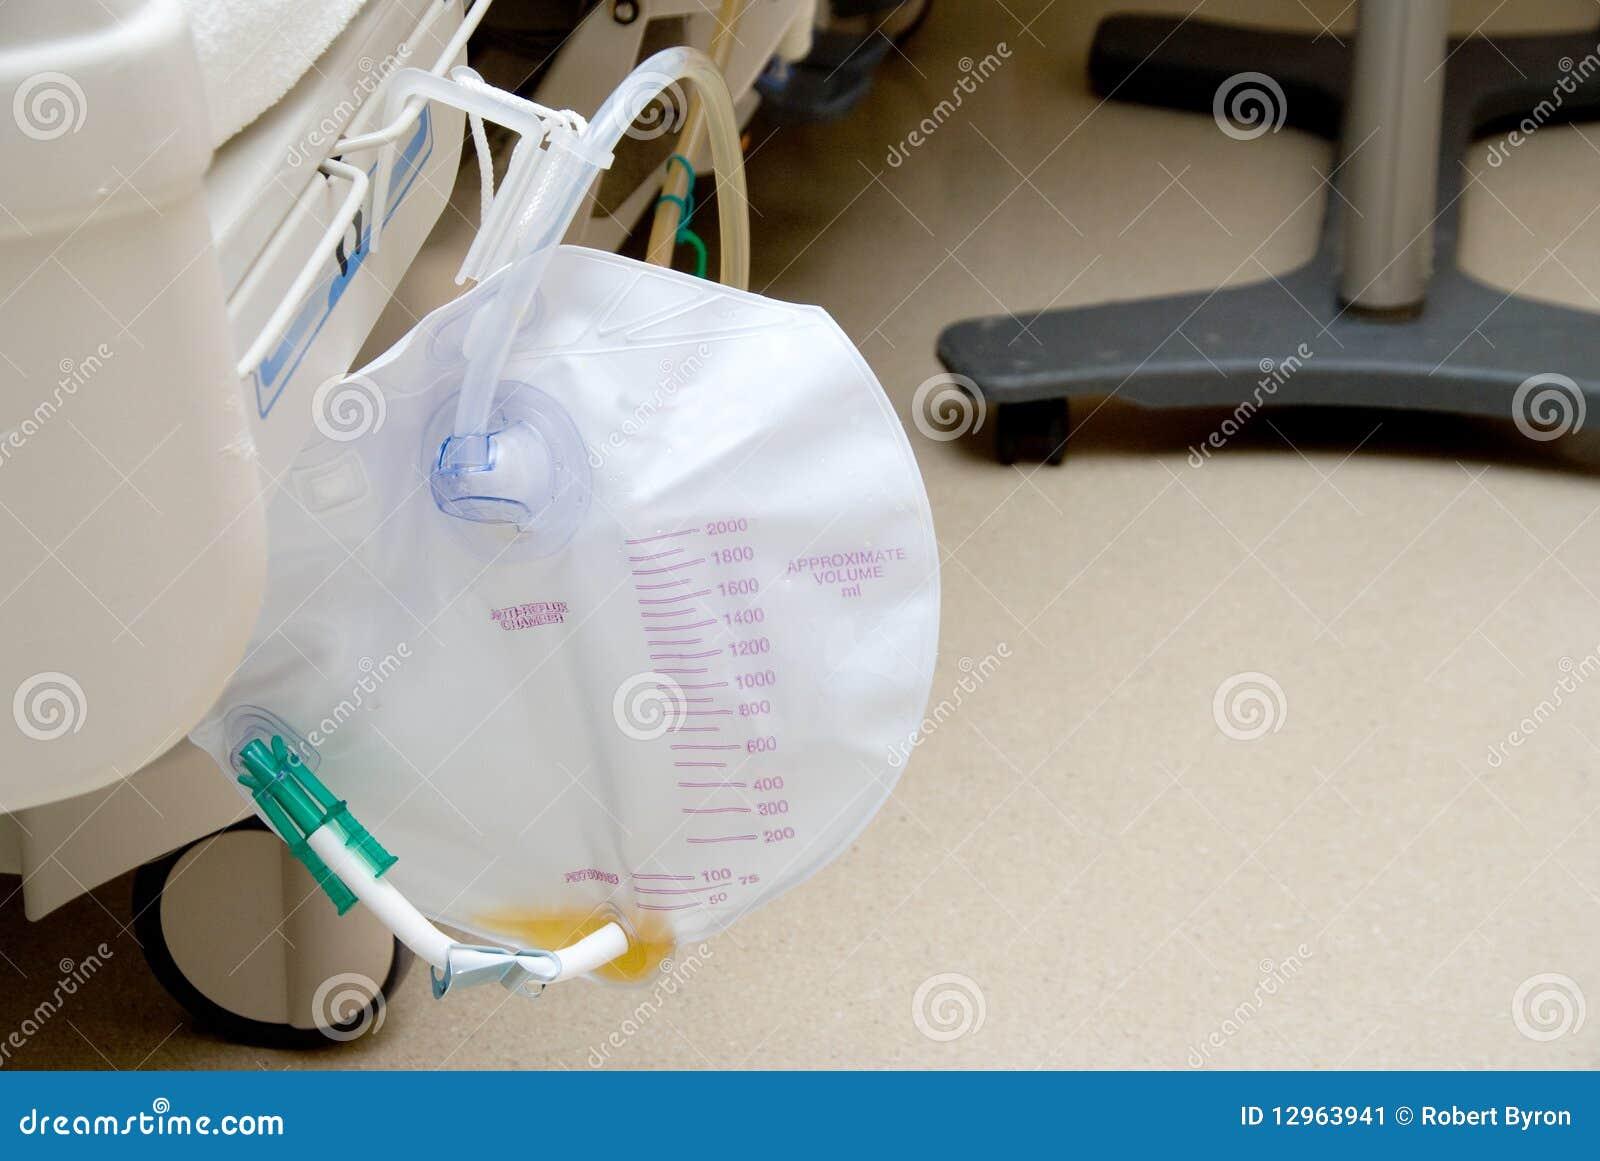 u bag urine collection instructions